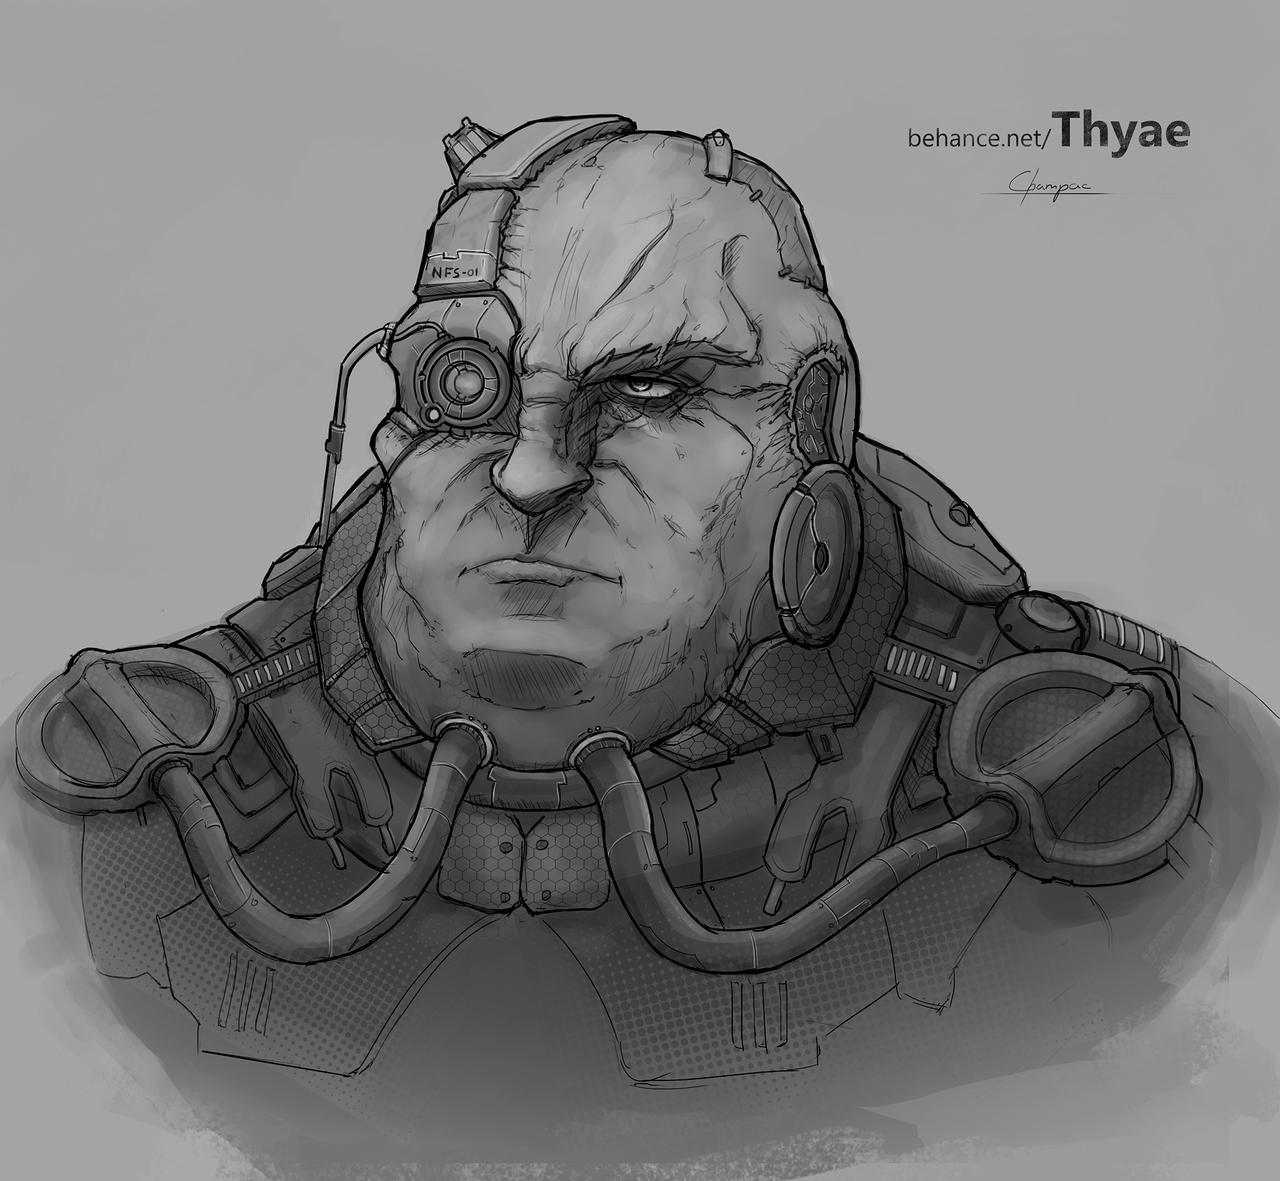 Cyborg concept by Thyae